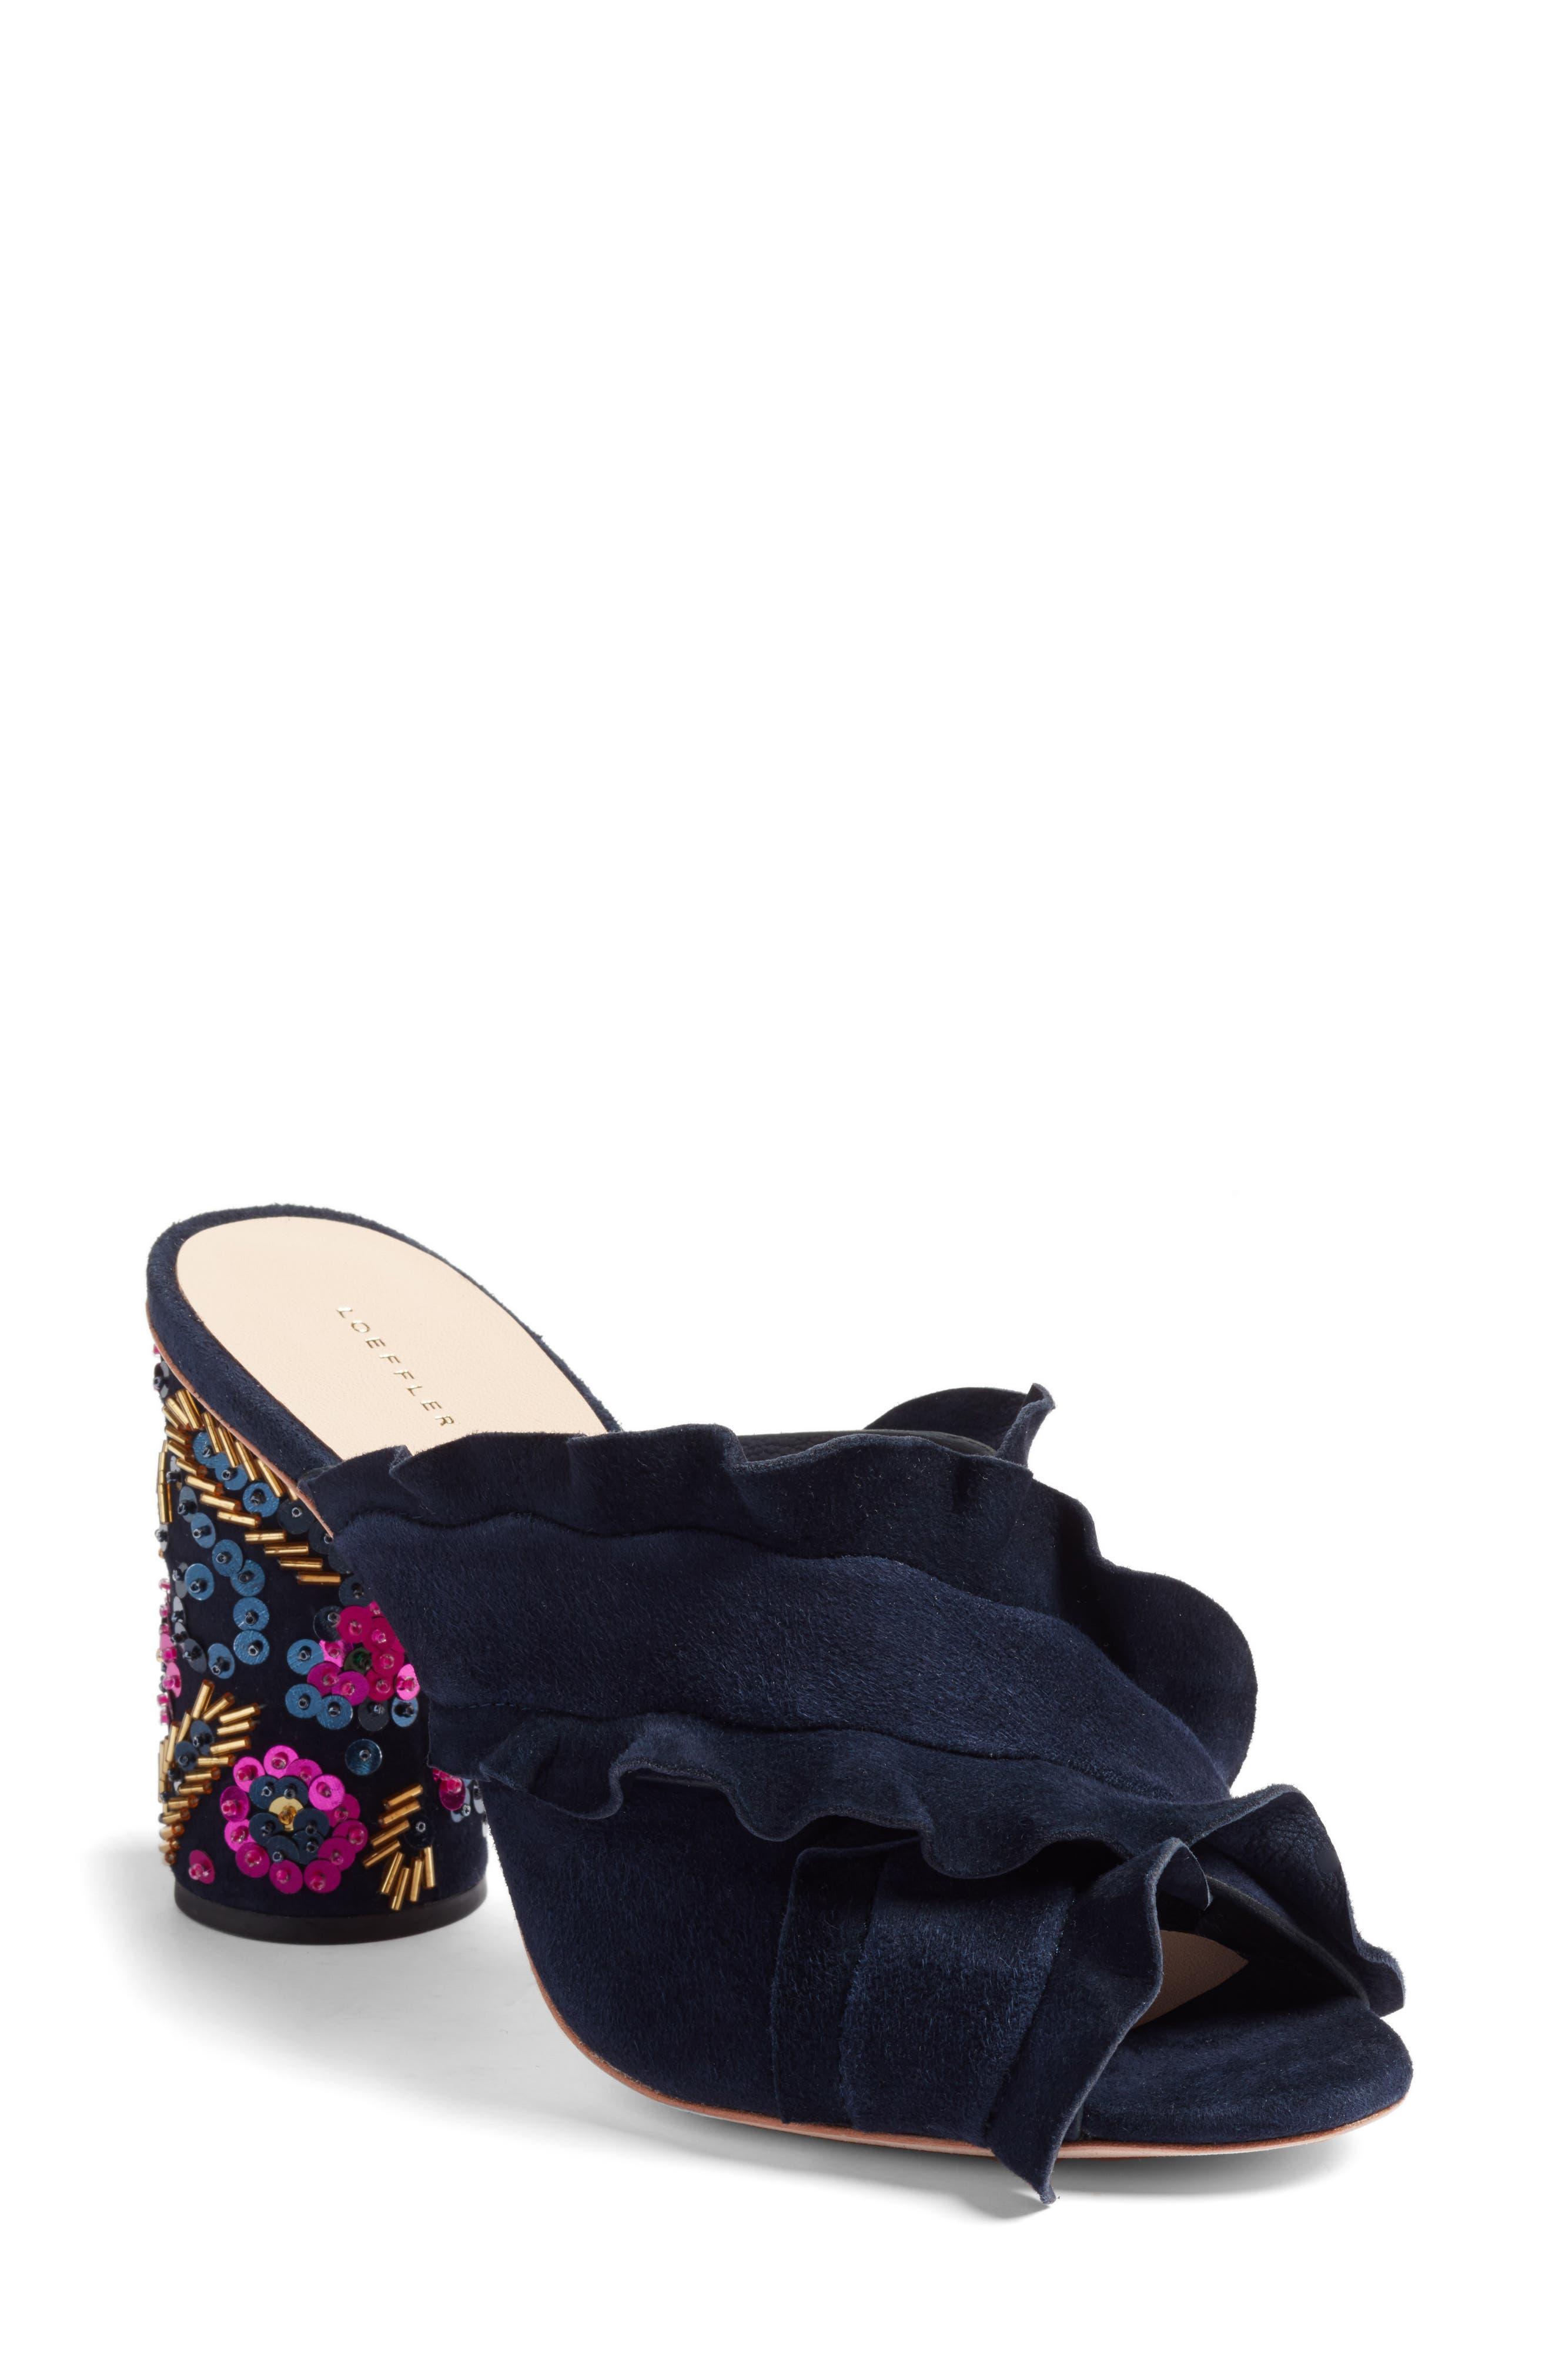 Main Image - Loeffler Randall Kaya Embellished Ruffle Slide Sandal (Women)